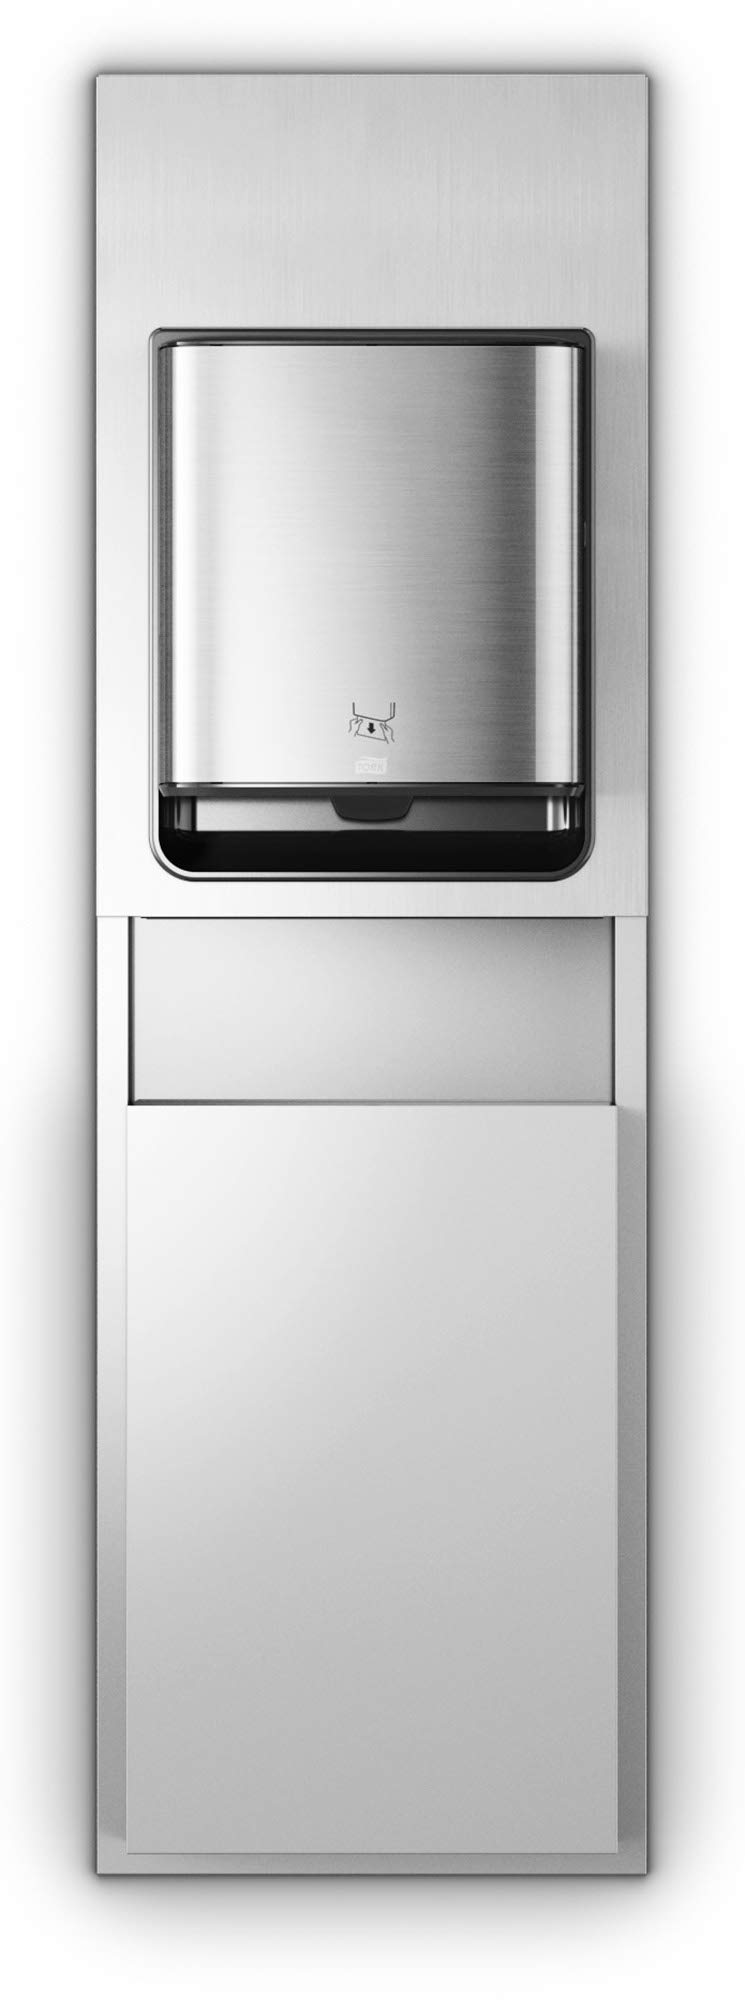 Tork 461022 Image Design Matic Paper Hand Towel Roll Dispenser, Recessed, 26.97'' Height x 17.64'' Width x 7.87'' Depth, Stainless Steel (Case of 1 Dispenser)